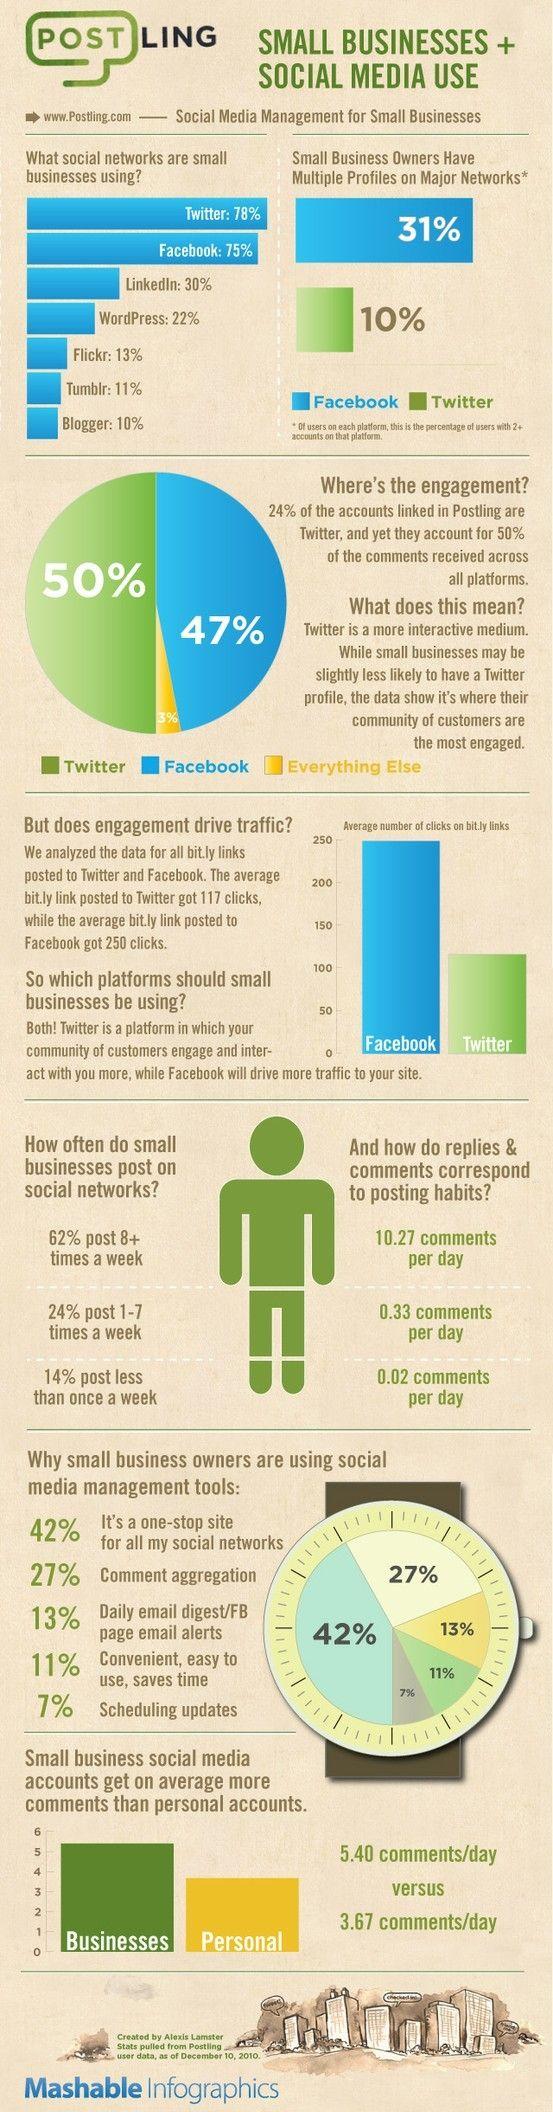 Small Businesses + social media